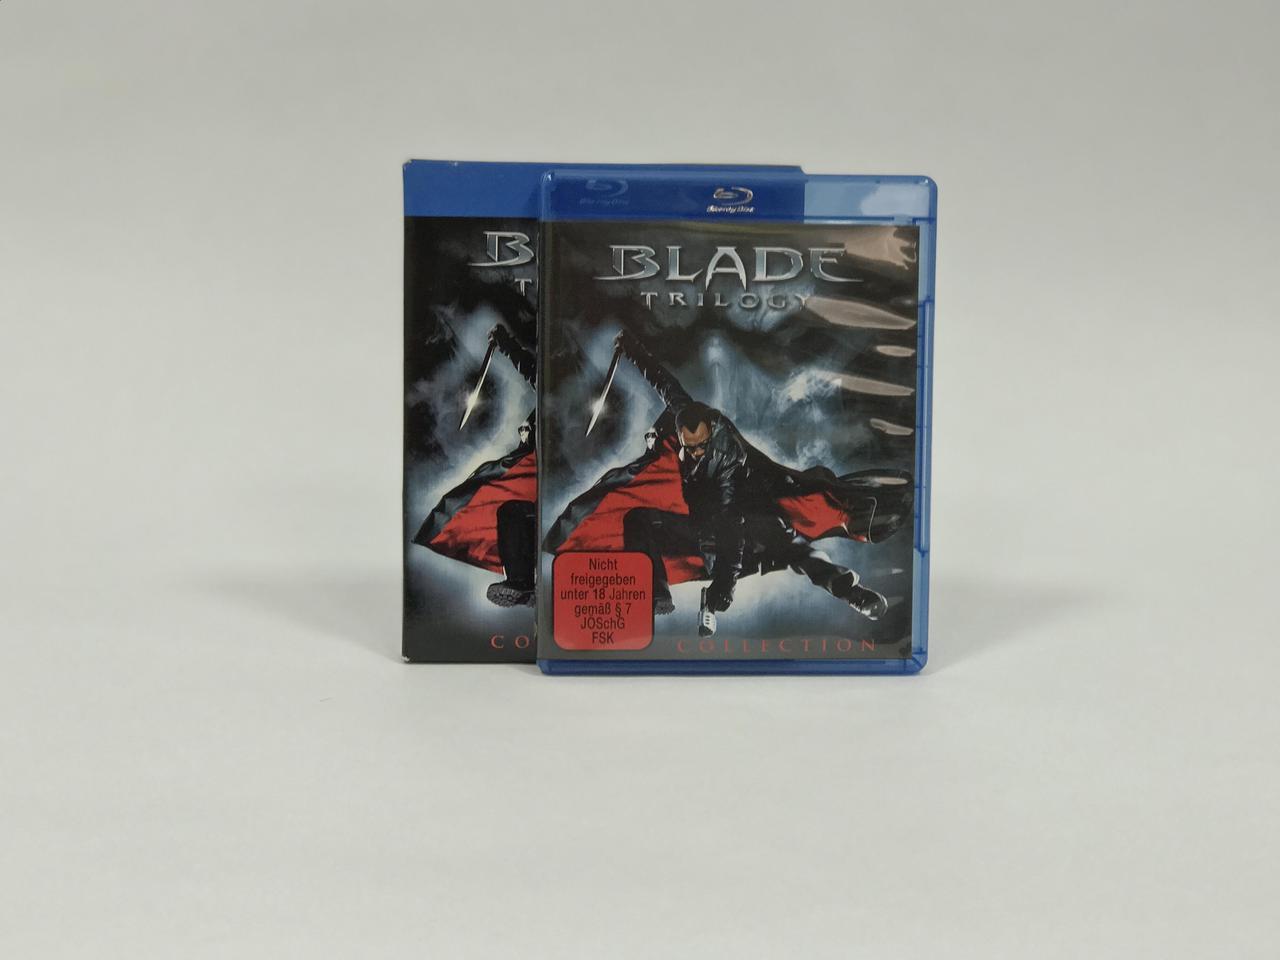 Blade Trilogy Blu-ray Disc